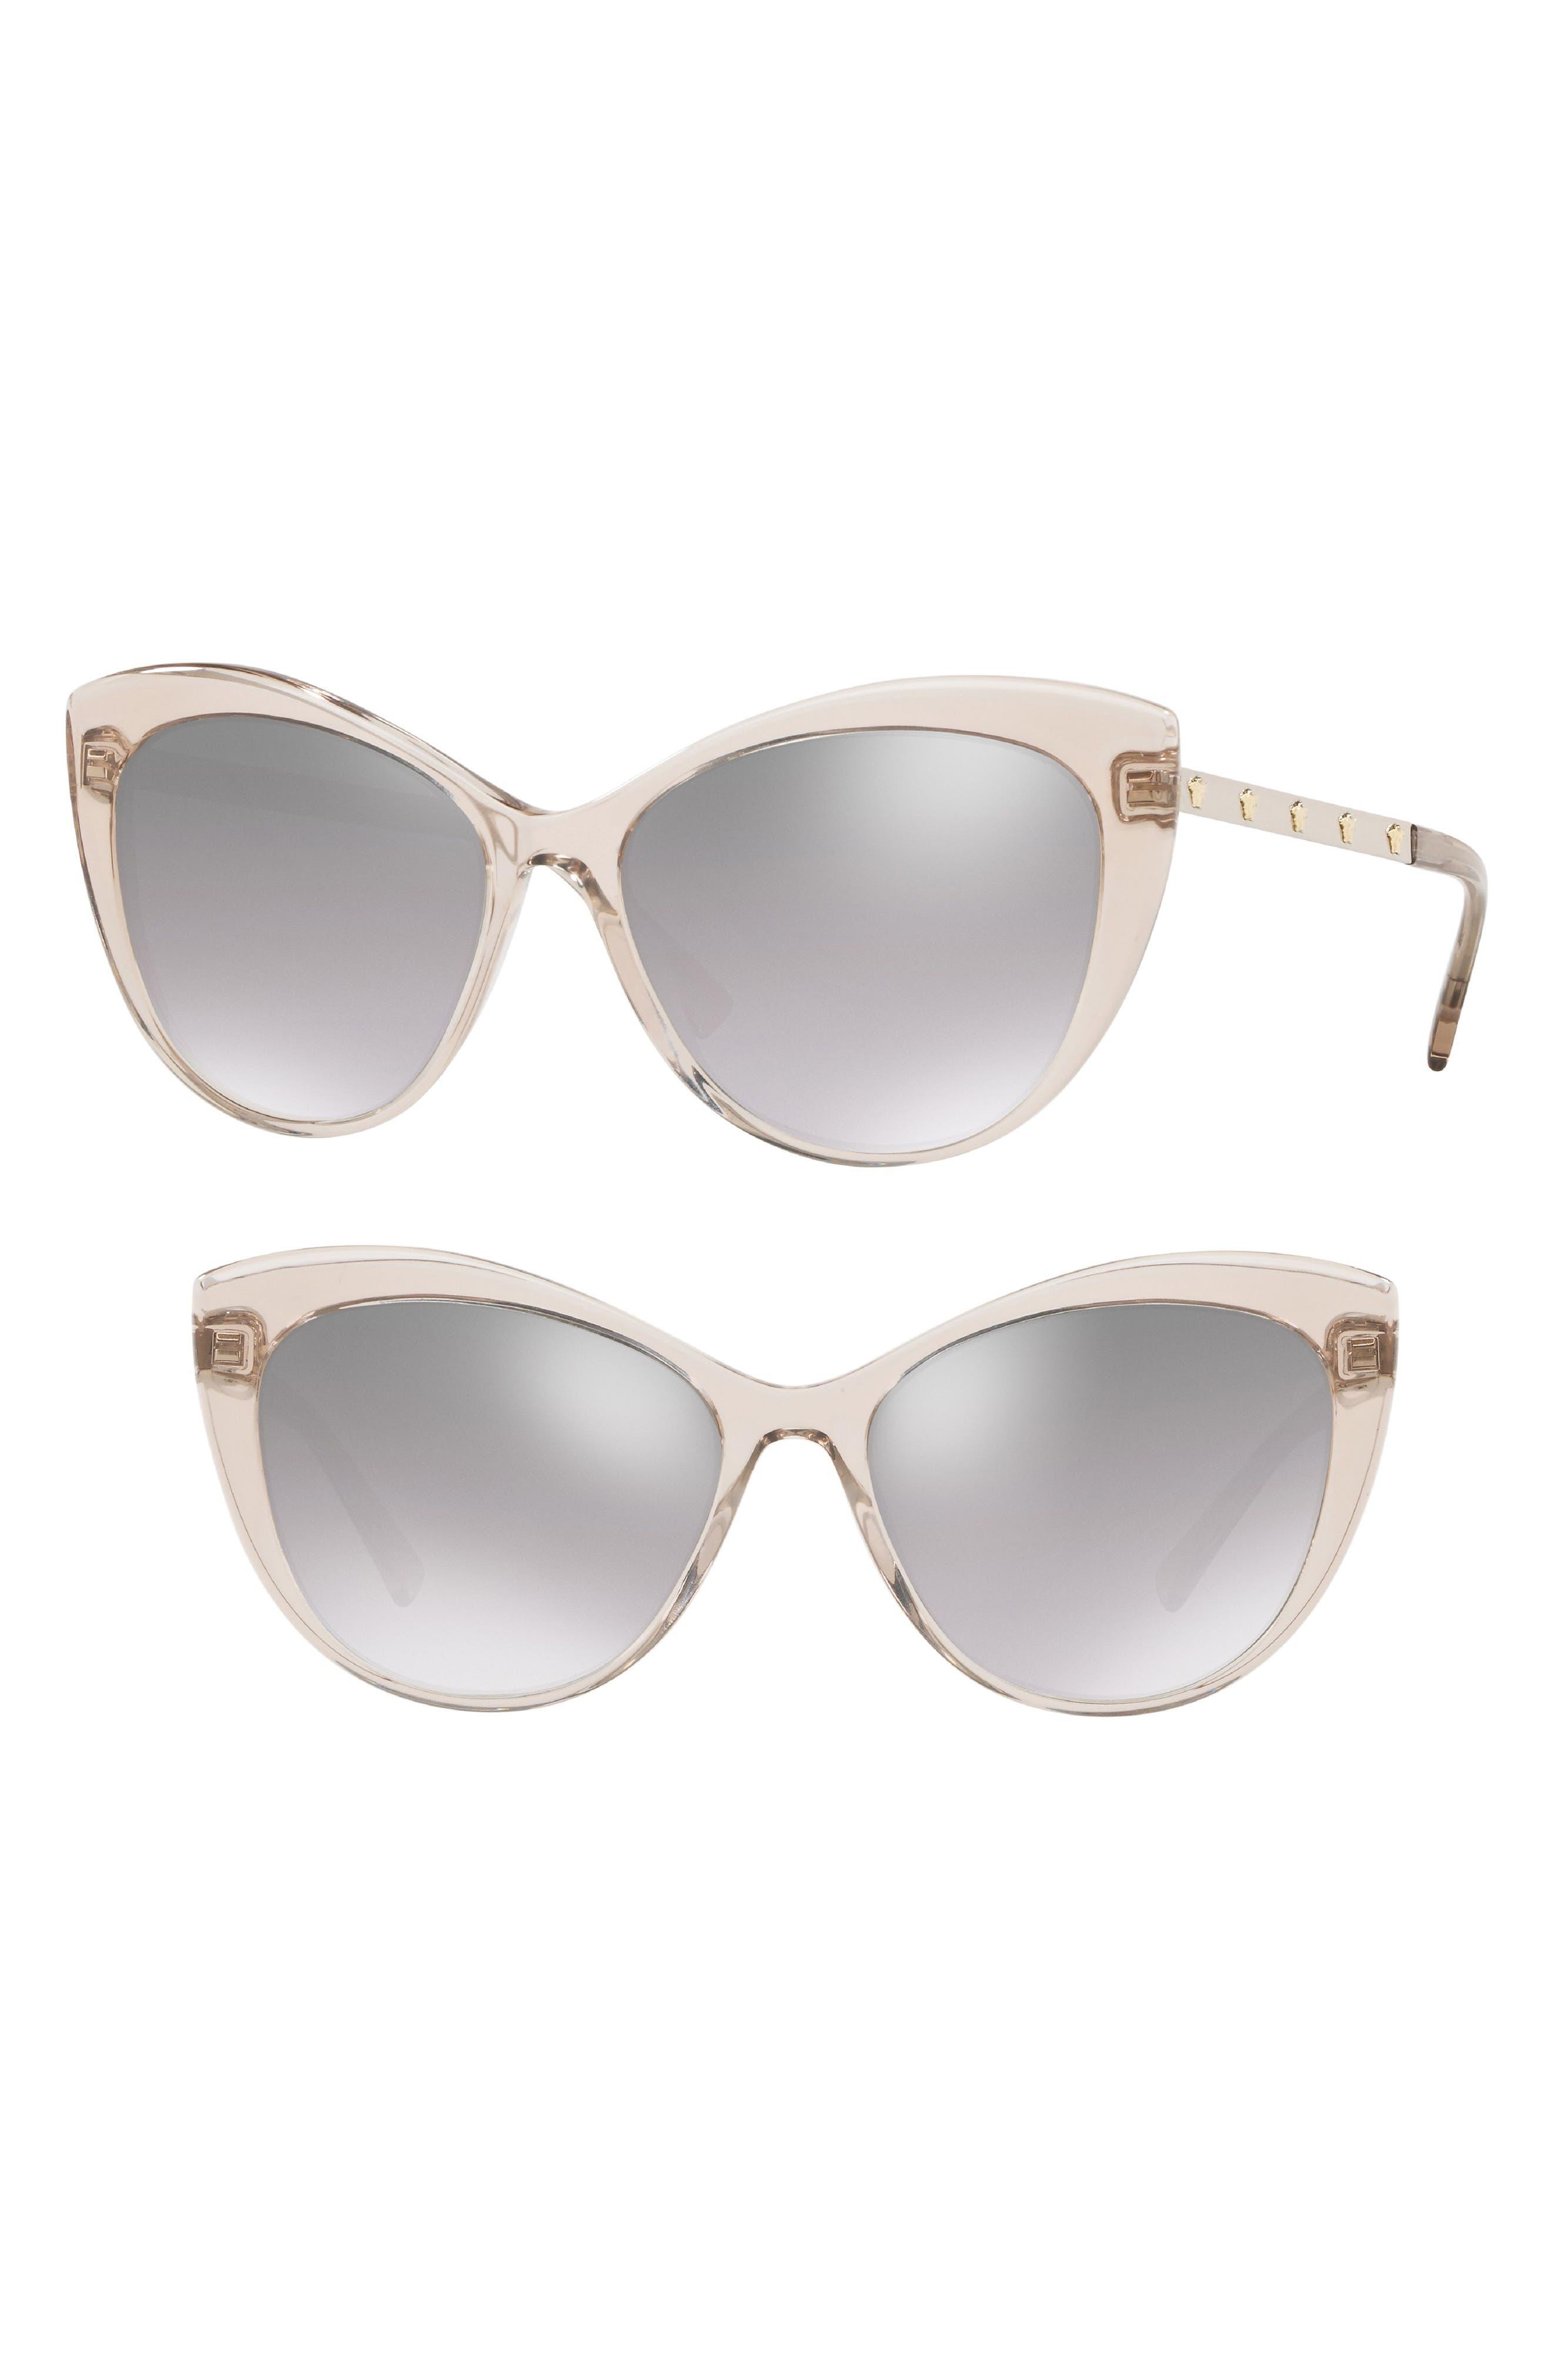 615da103127d Versace Medusa 57Mm Cat Eye Sunglasses - Grey  Silver Gradient Mirror